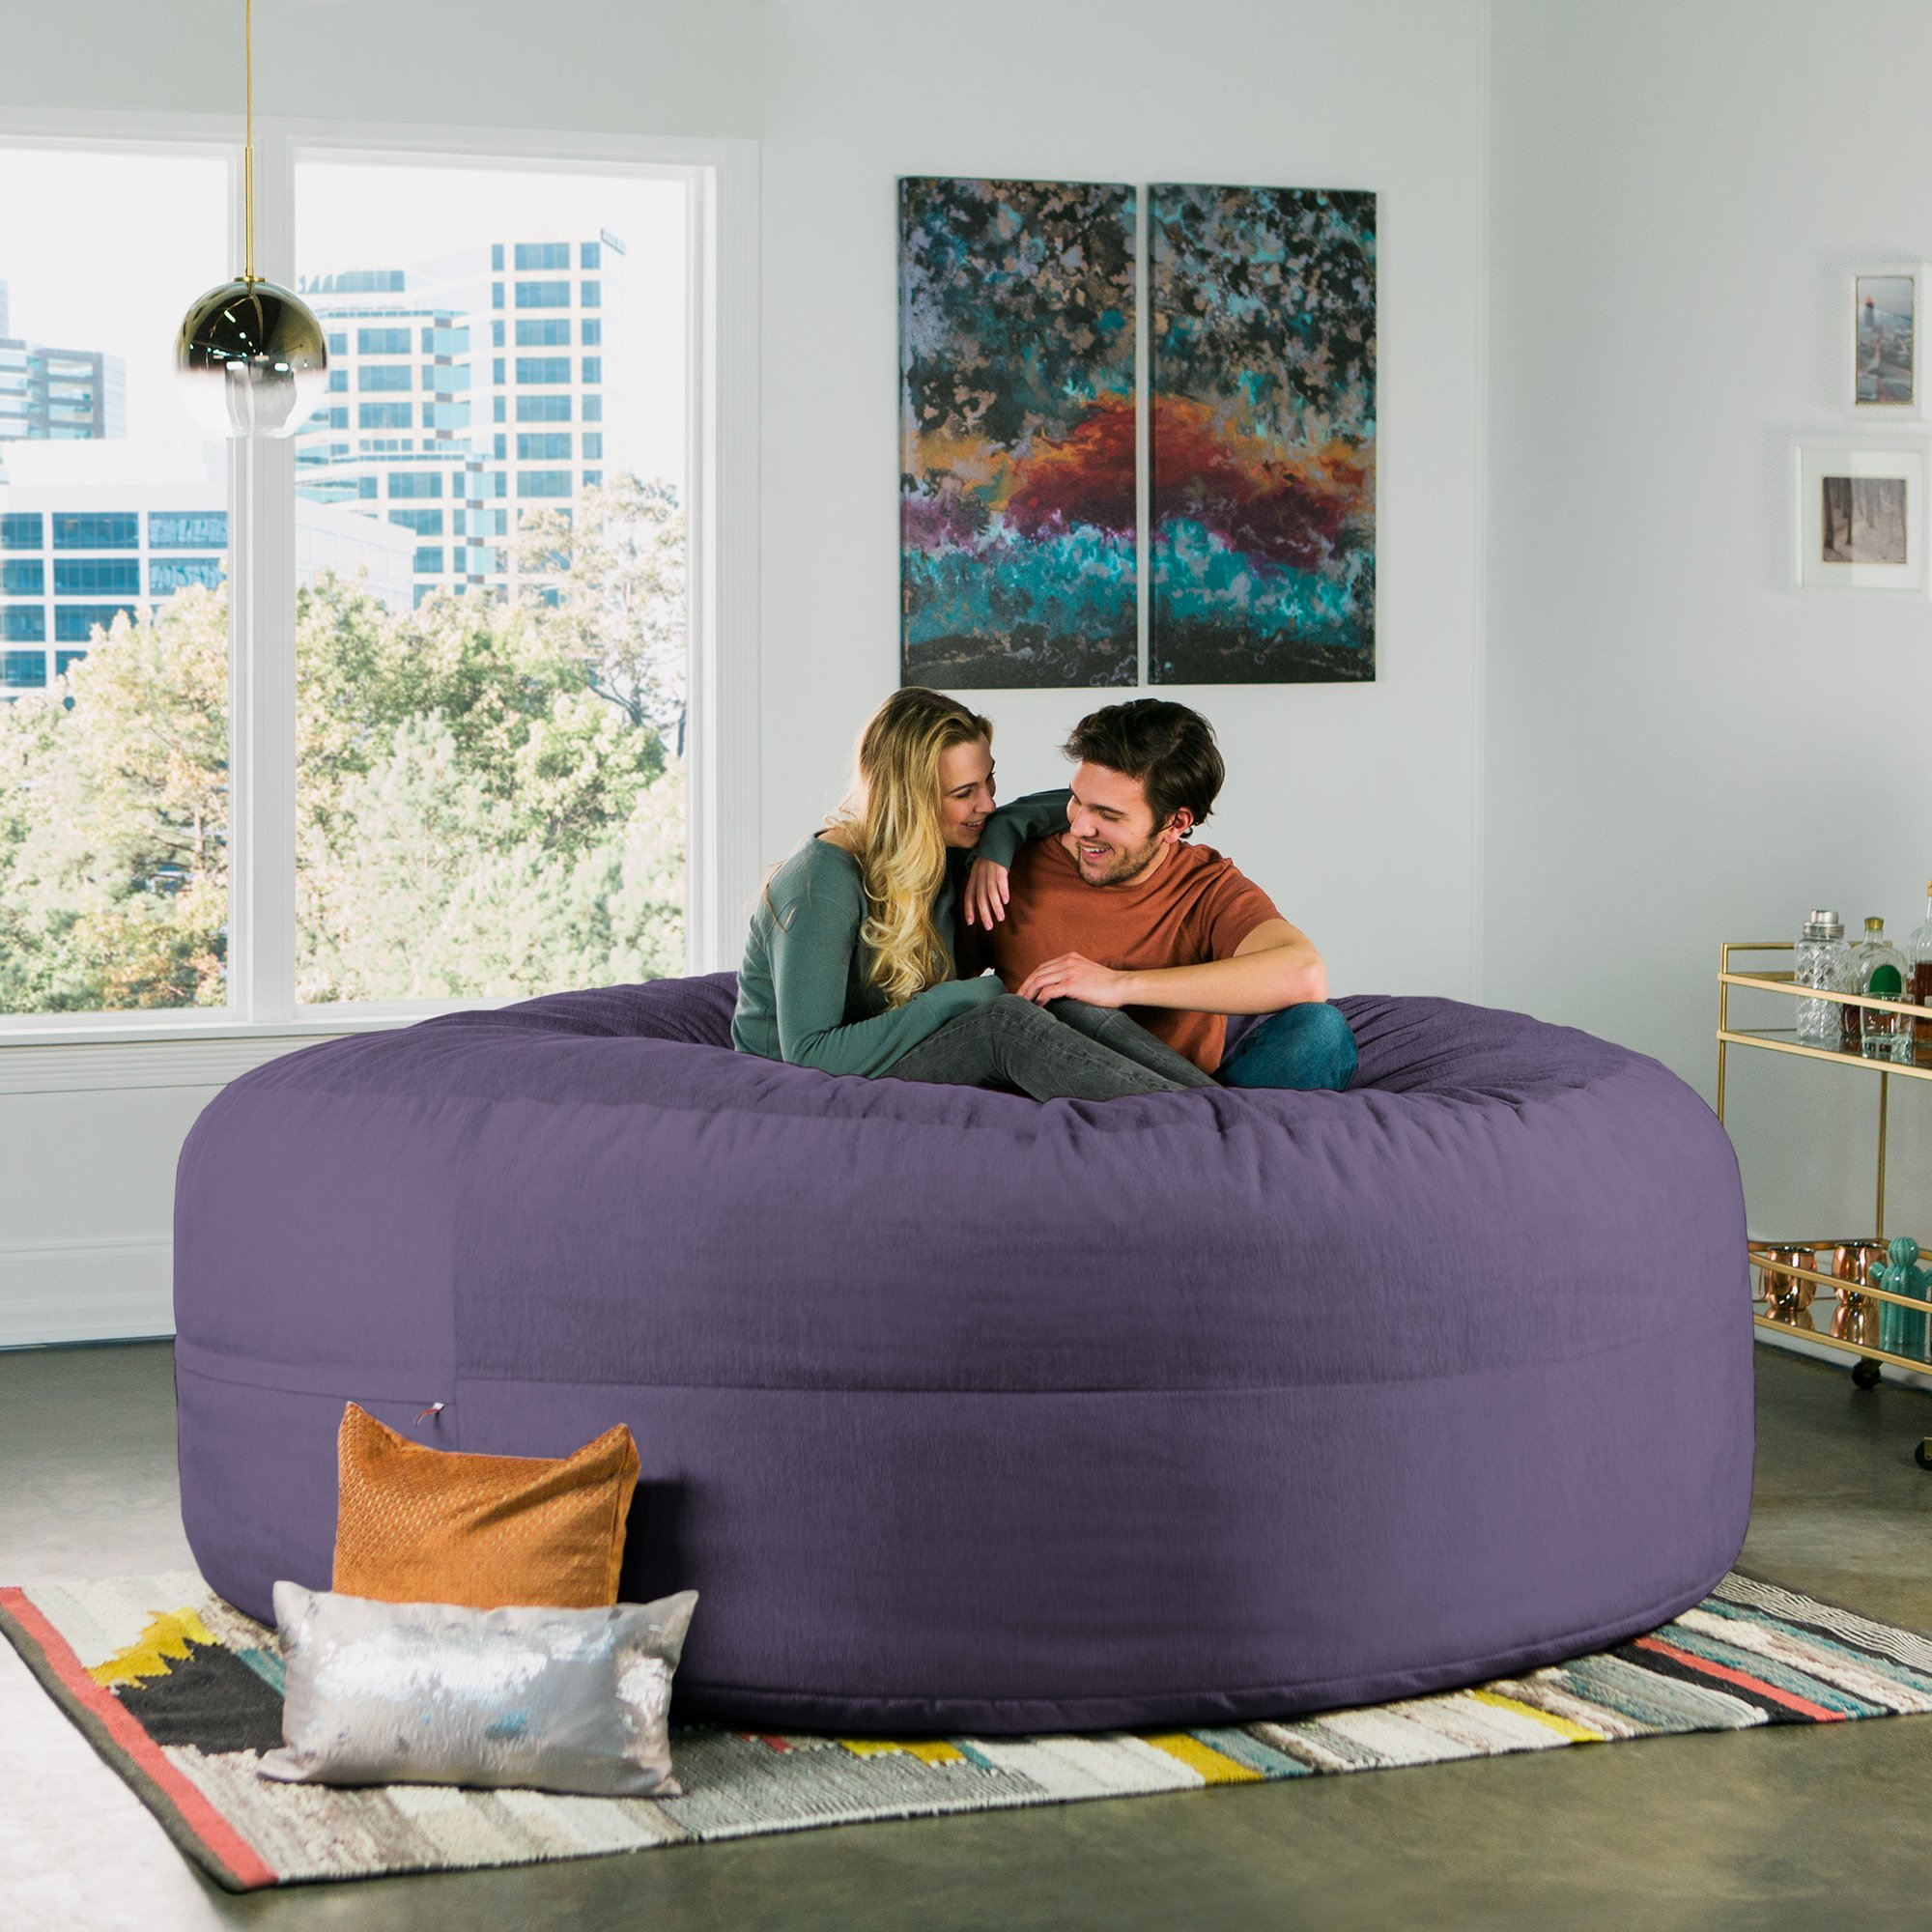 Jaxx Cocoon 8 Foot Huge Sleeper Bean Bag Bed - Chenille, Plum by Jaxx (Image #6)